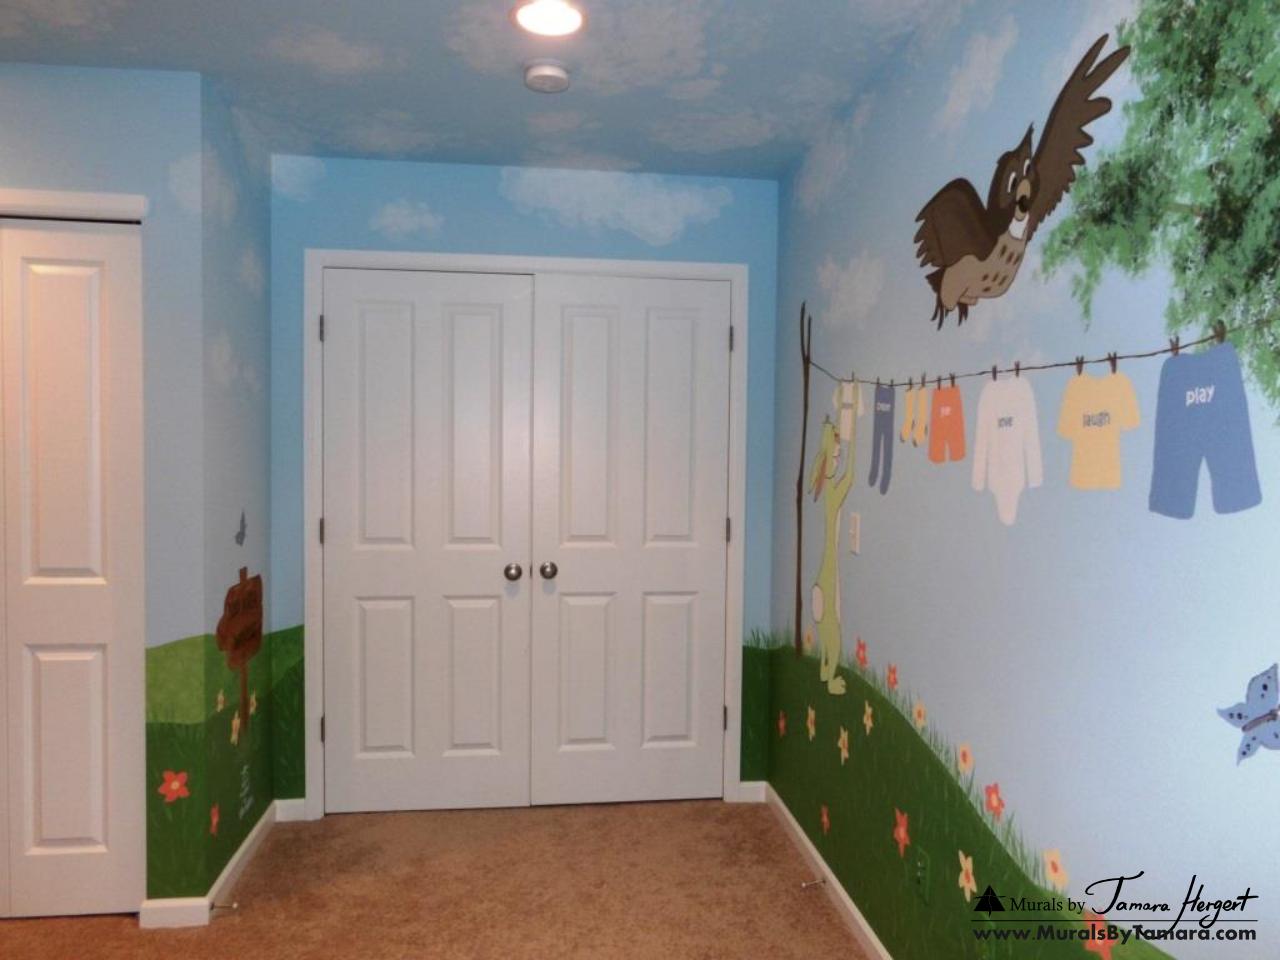 Winnie the Pooh mural back wall - kids room mural by Tamara Hergert